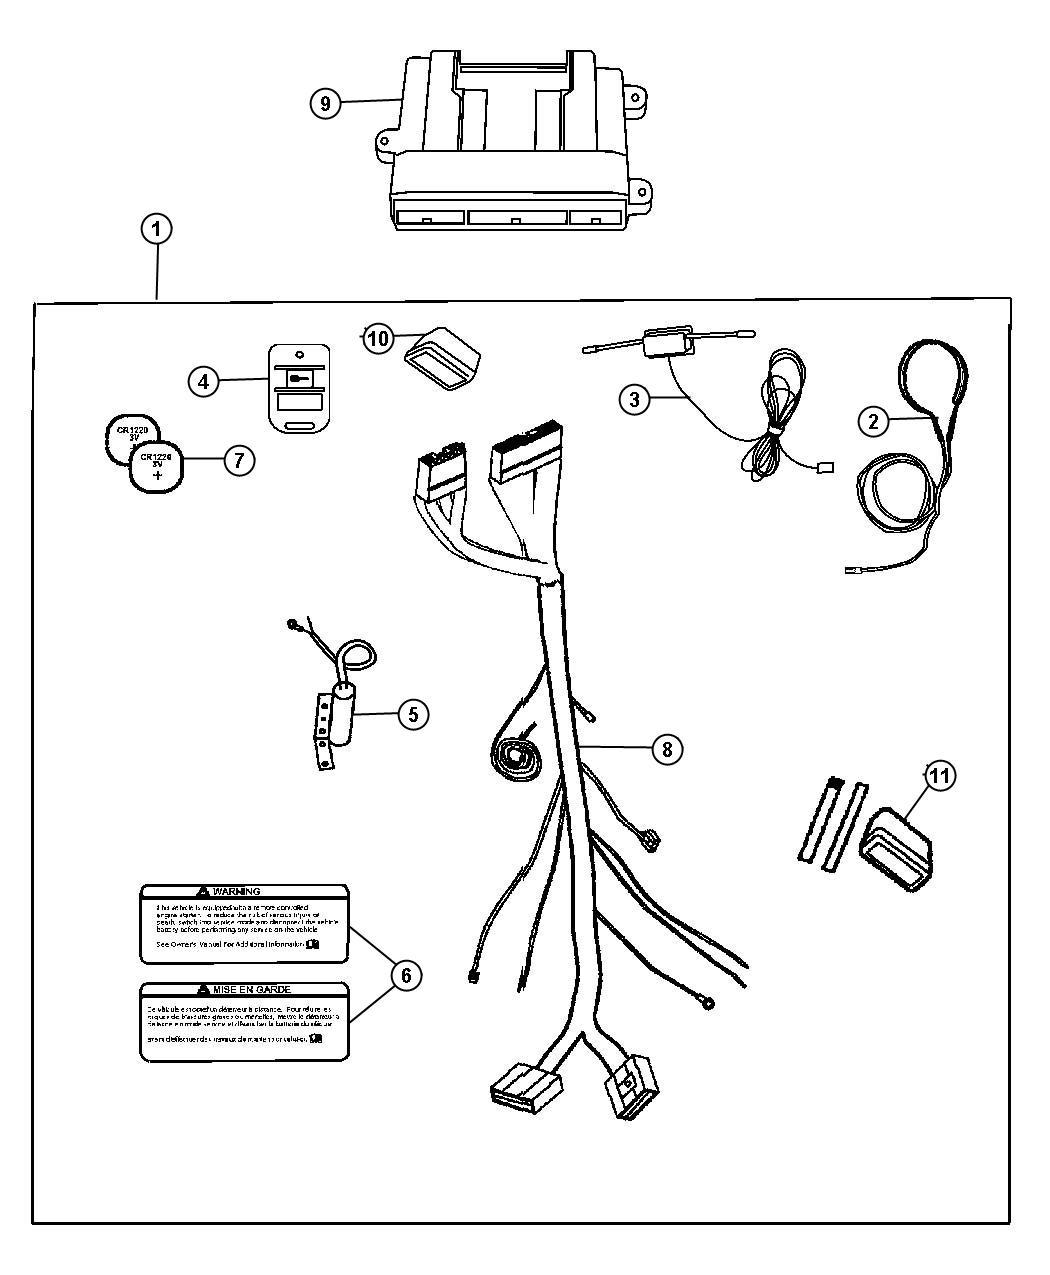 Dodge Ram 3500 Transmitter. Remote, kit, installation